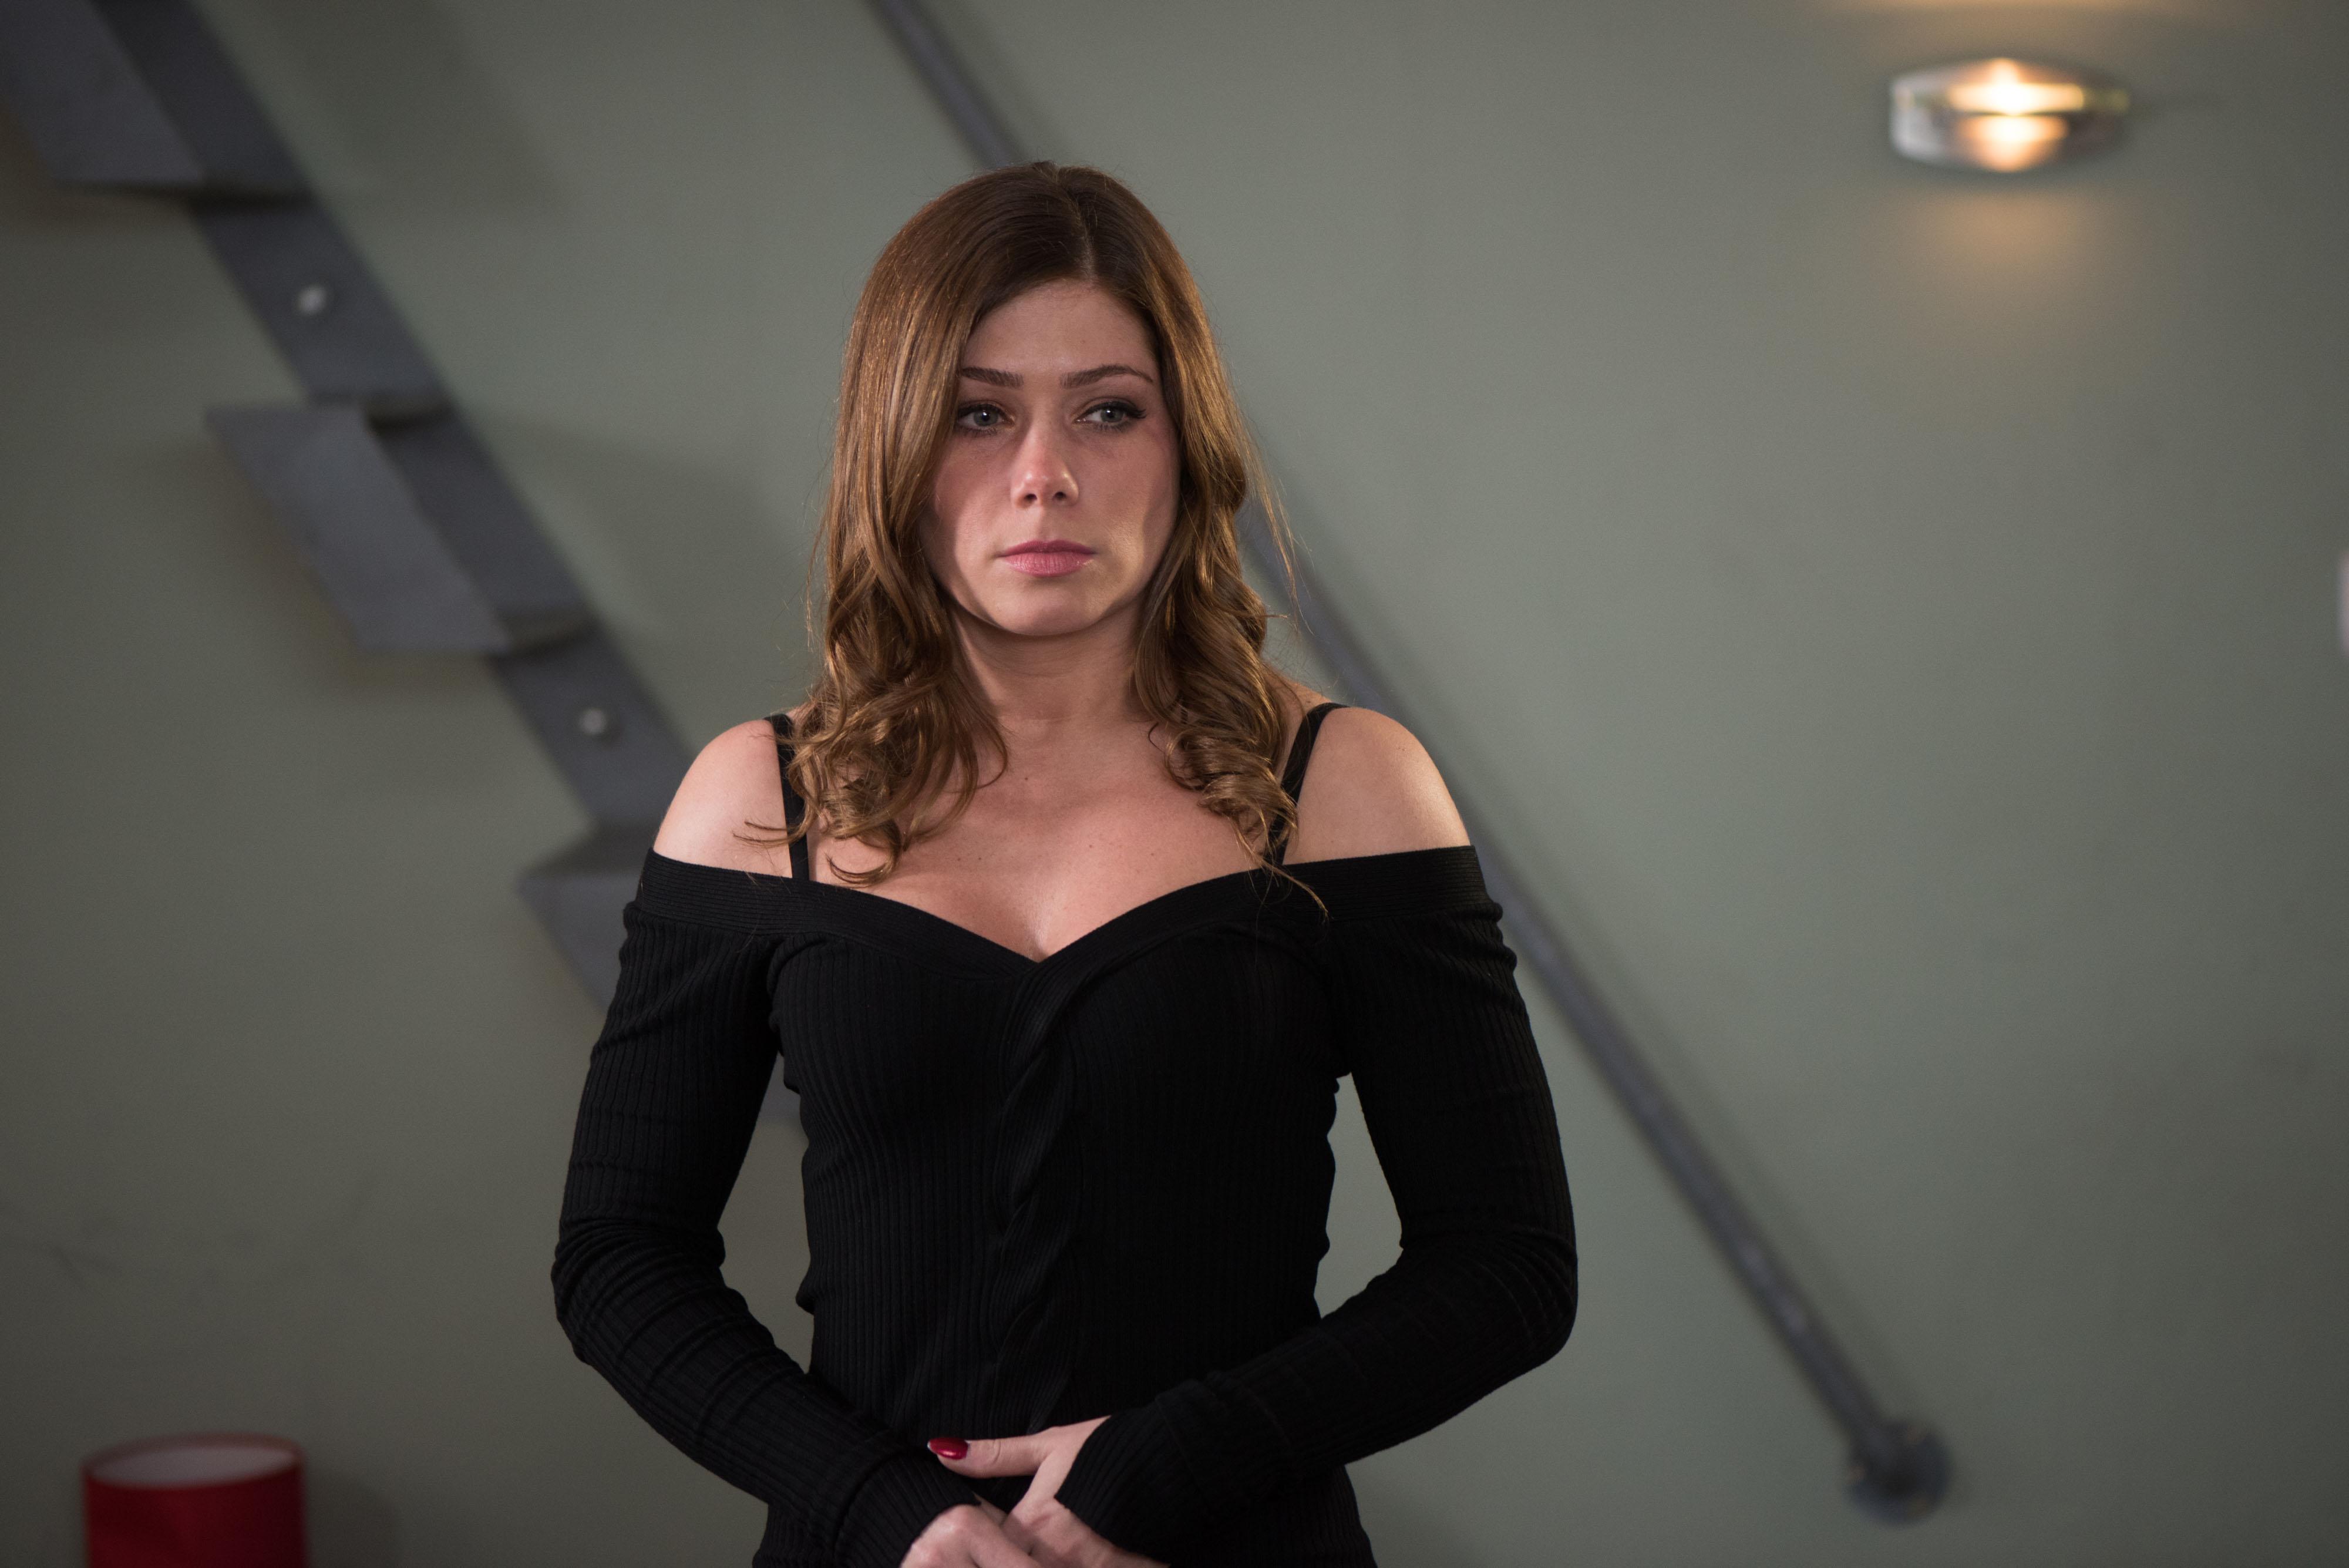 Hollyoaks star Nikki Sanderson speaks out about her depression battle